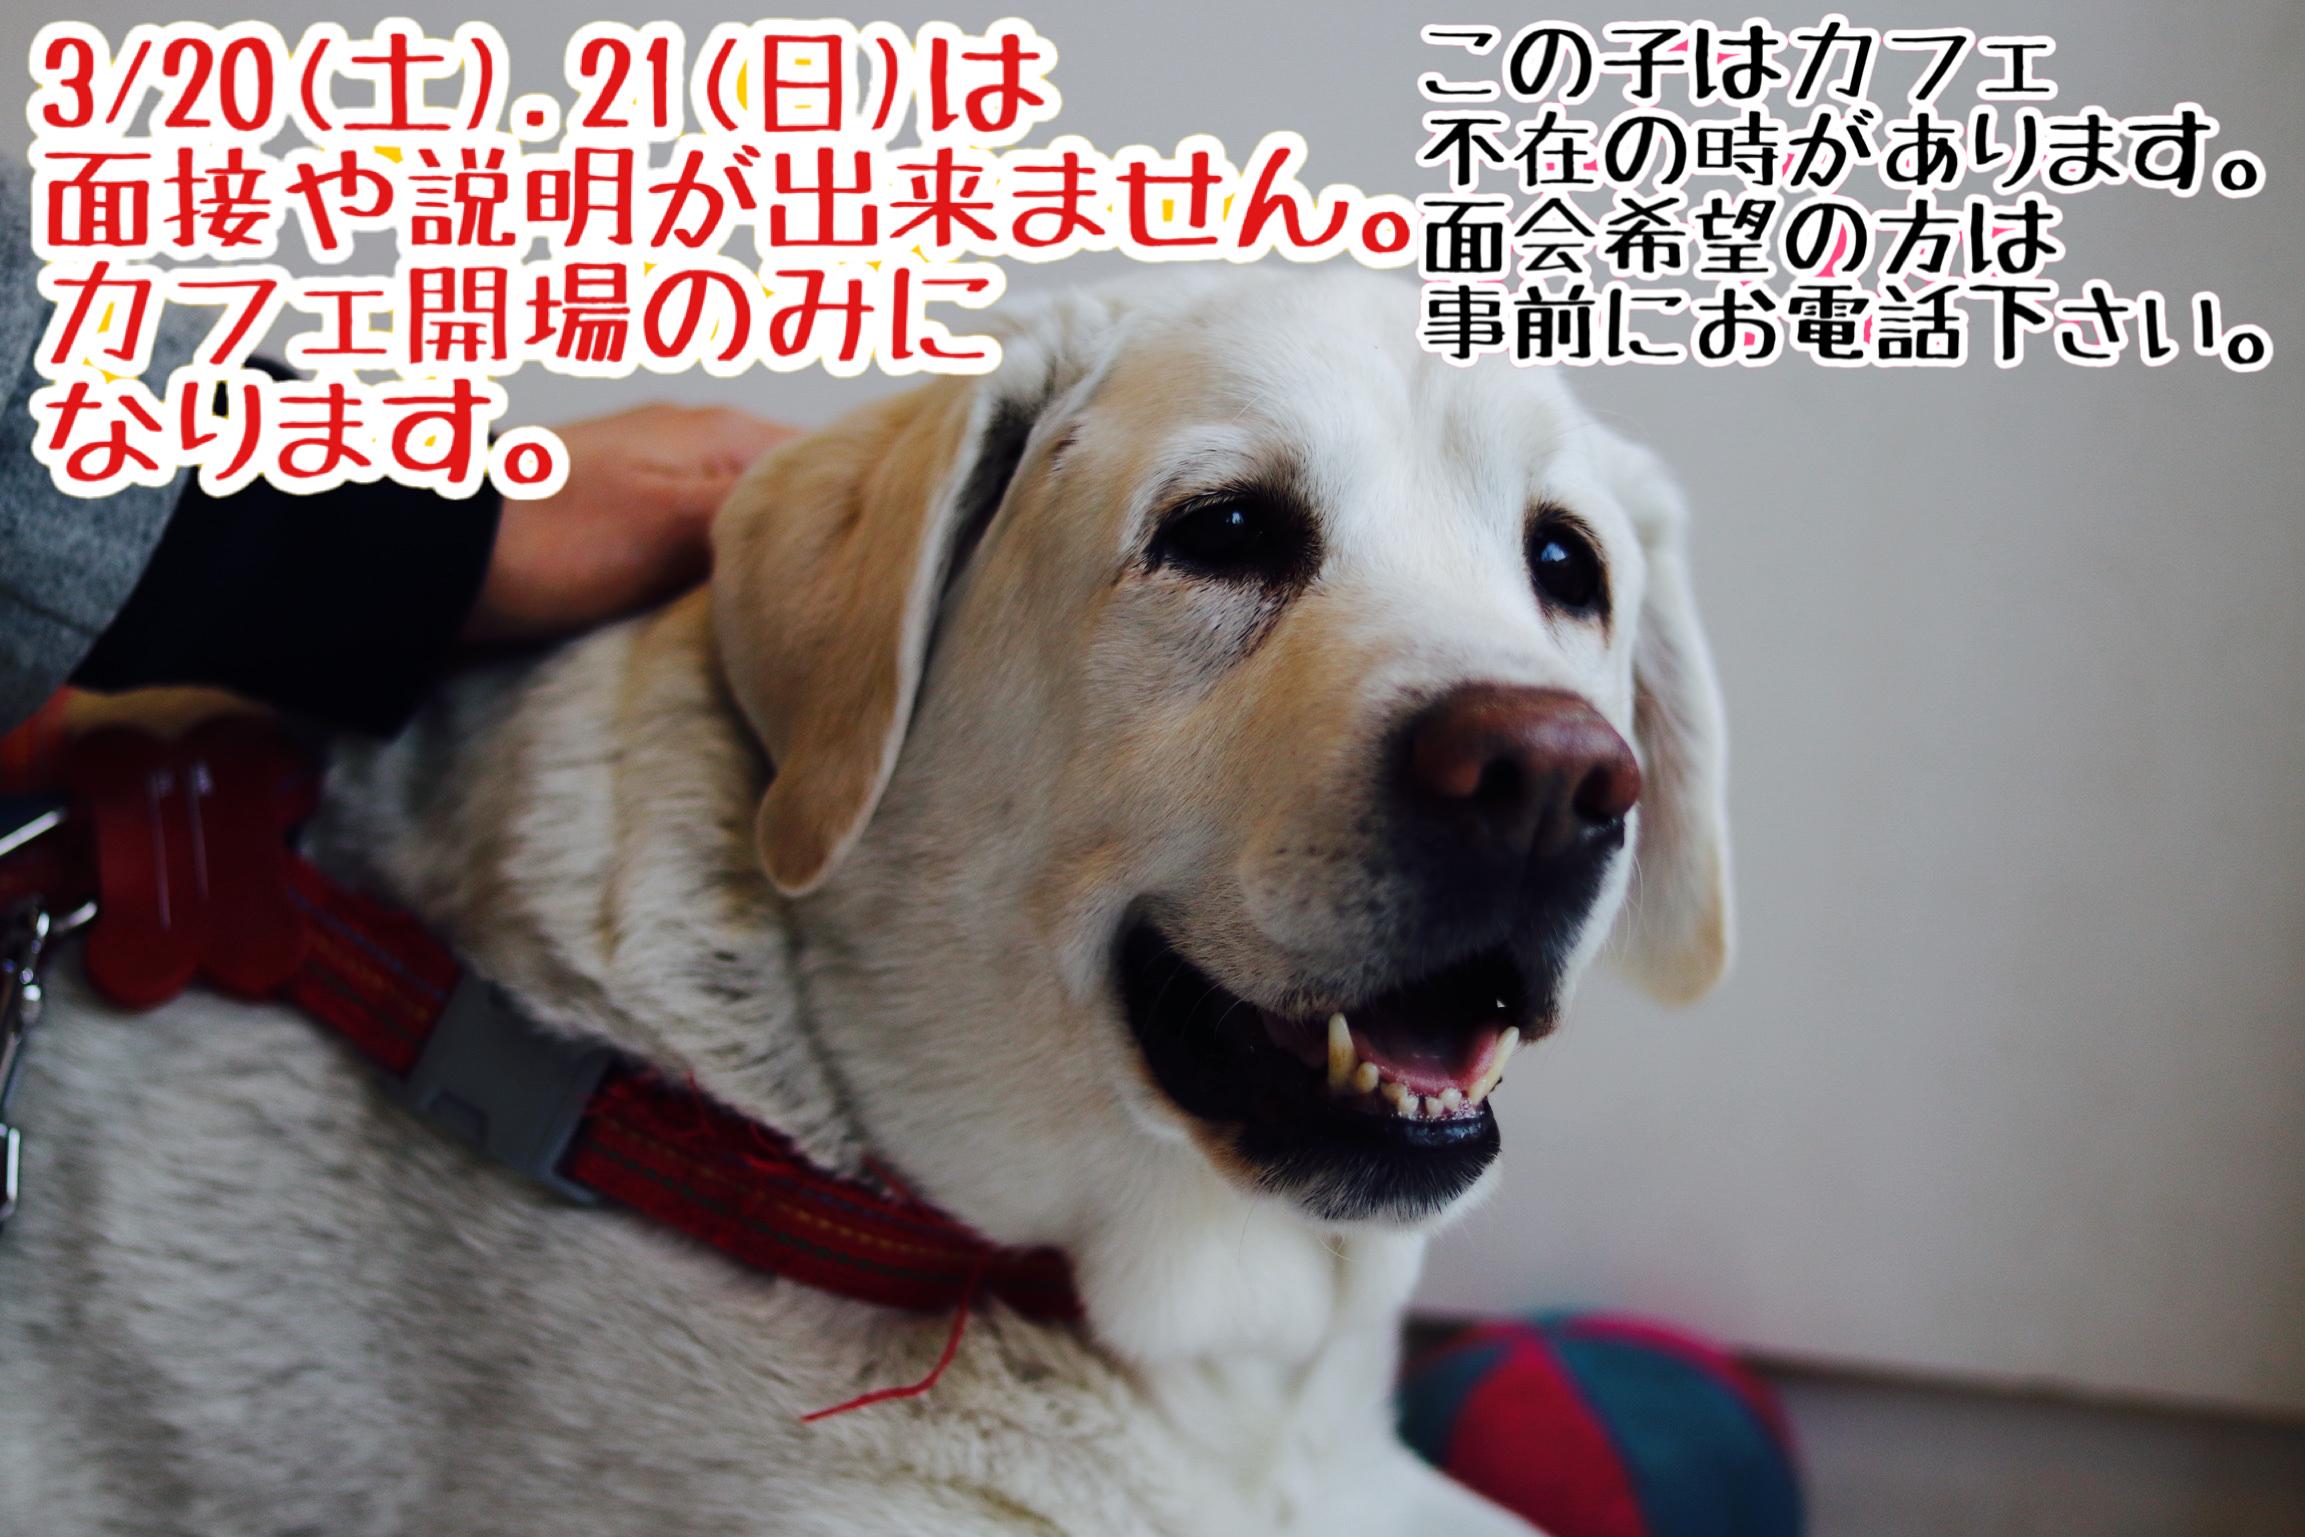 <ul> <li>犬種:ラブラドールレトリバー 性別:女の子 名前:シェリー 年齢:2010年春頃生まれ 保護経緯:飼い主が高齢になり病気療養のため飼育困難</li> </ul>